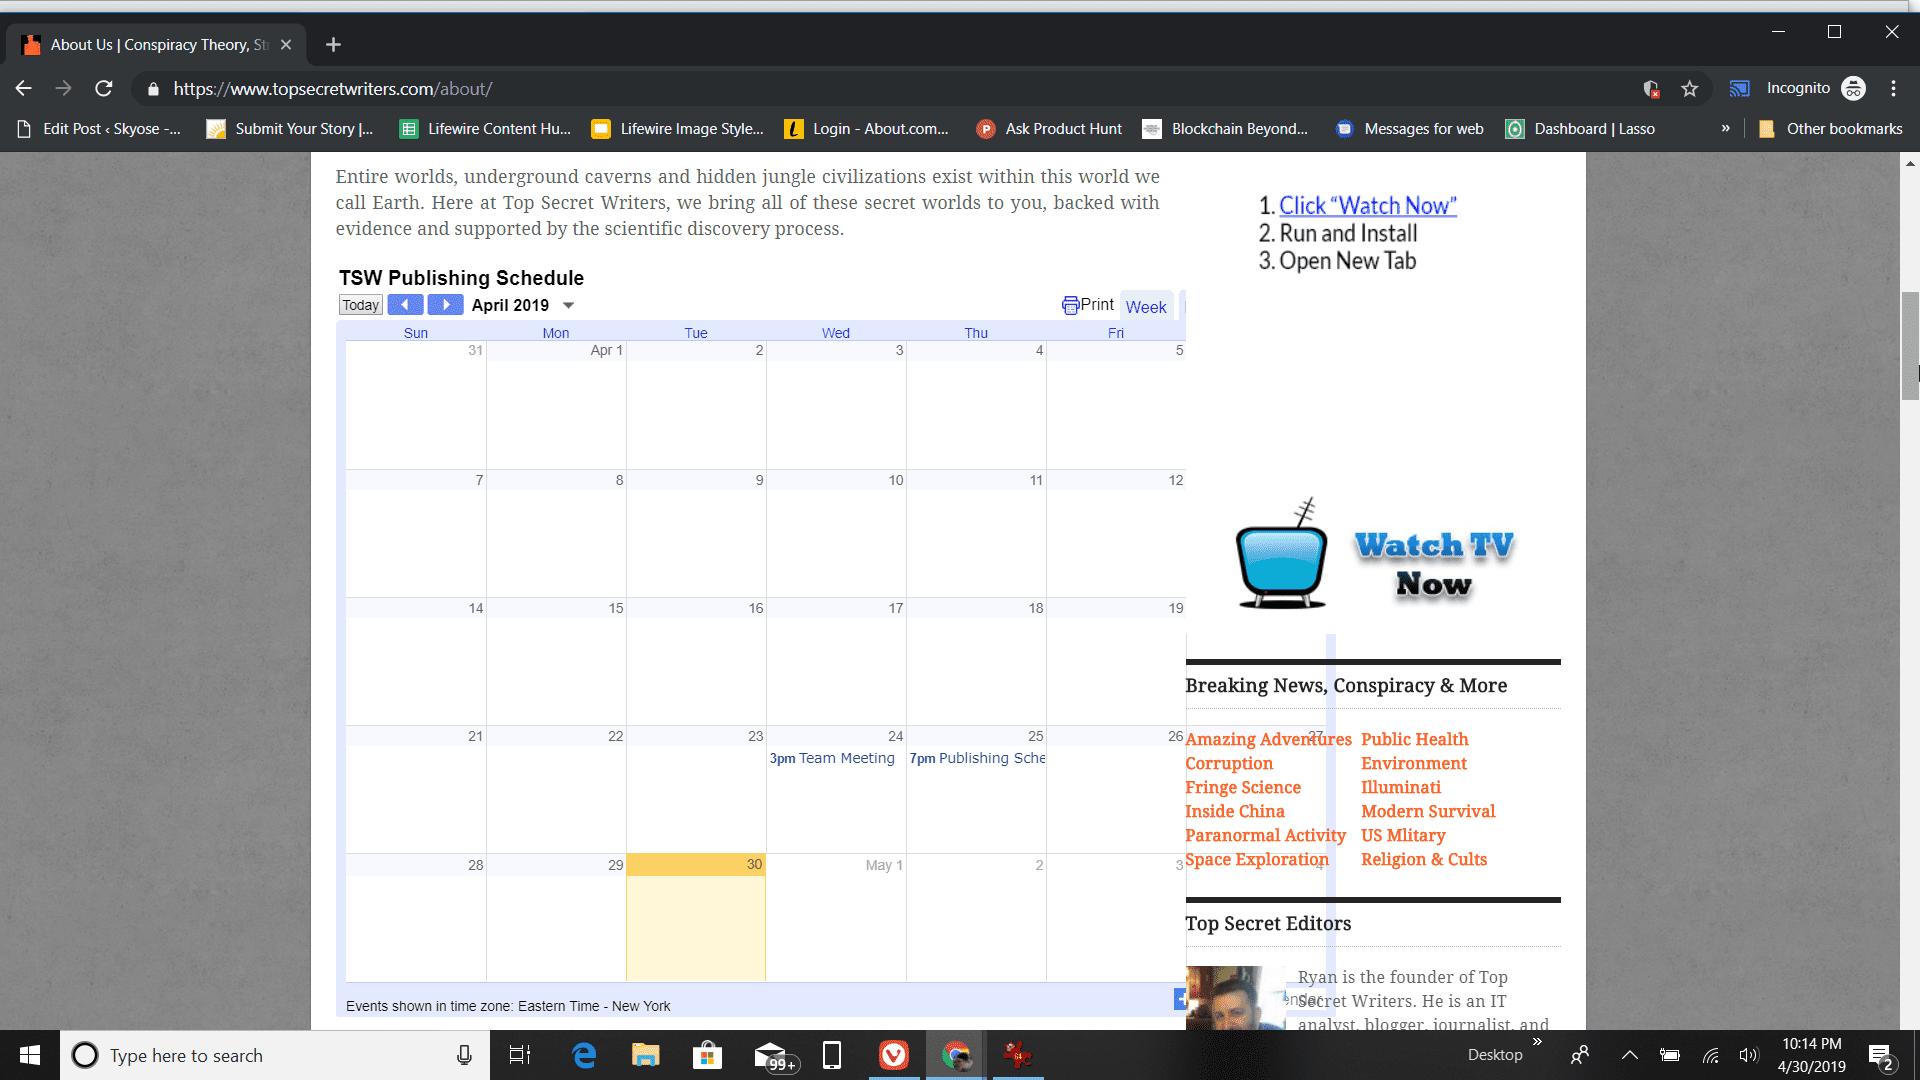 Embedded Google Calendar on a blog